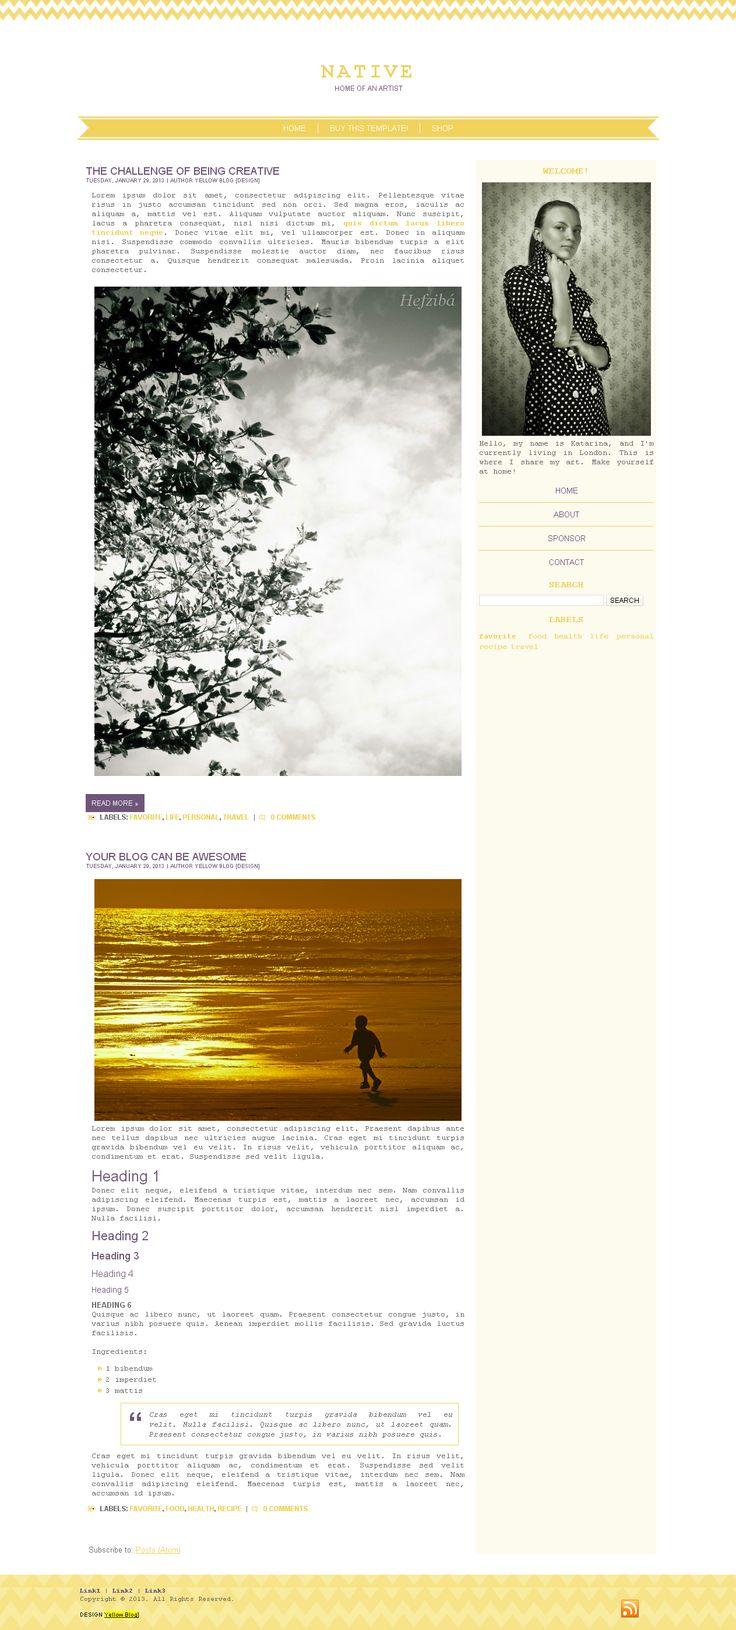 Native - Blogger, Worpress (exclusive) | Yellow Blog Design | LIVE DEMO http://1315v.blogspot.com ($27) #blog #layout #template #theme #custom #design #blogger #blogspot #wordpress #blogdesign